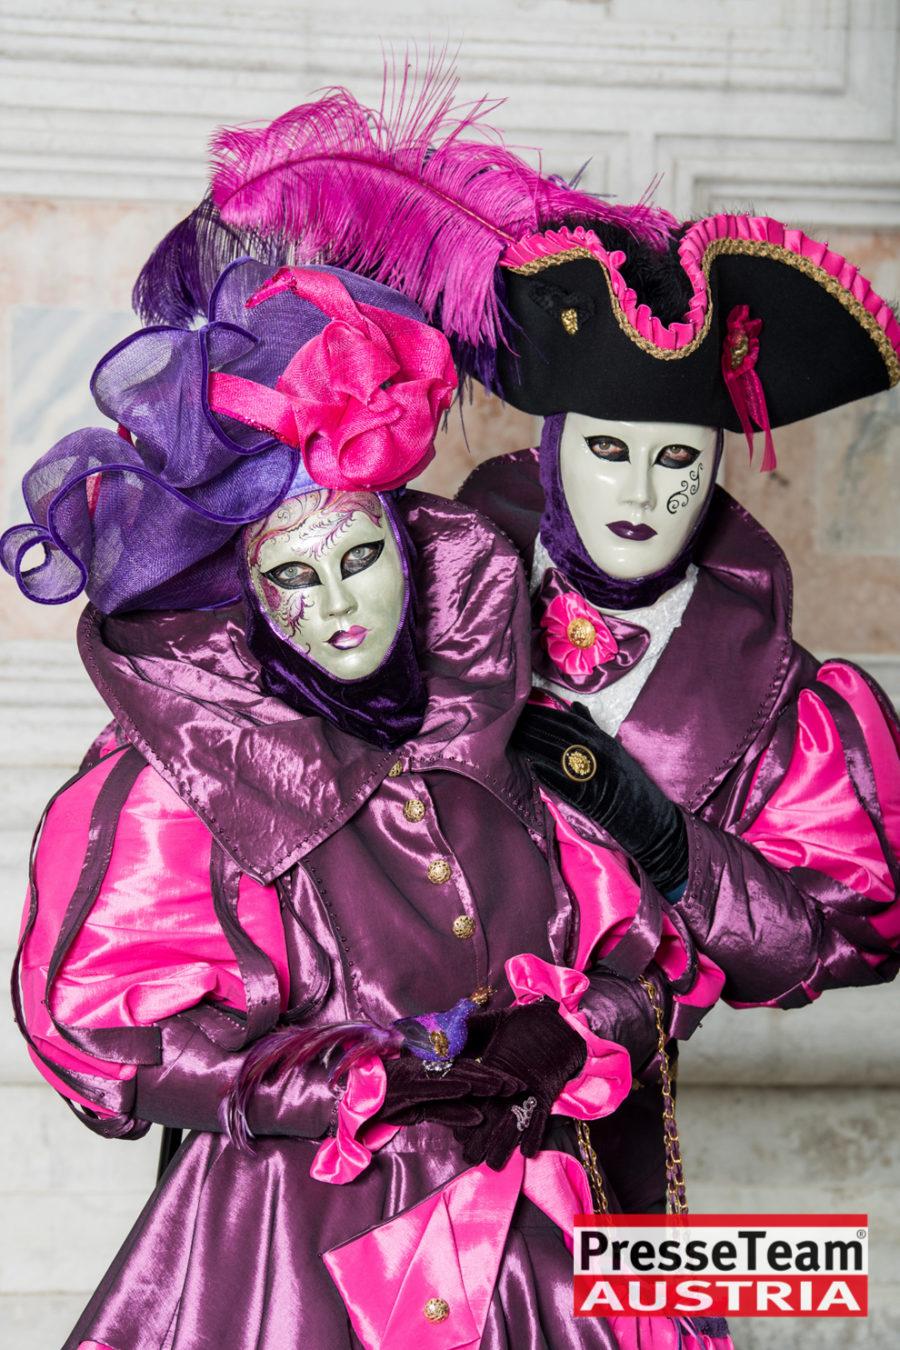 Karneval in Venedig Alexander Mandl 12 - TOP 15 Bilder Karneval in Venedig 2017